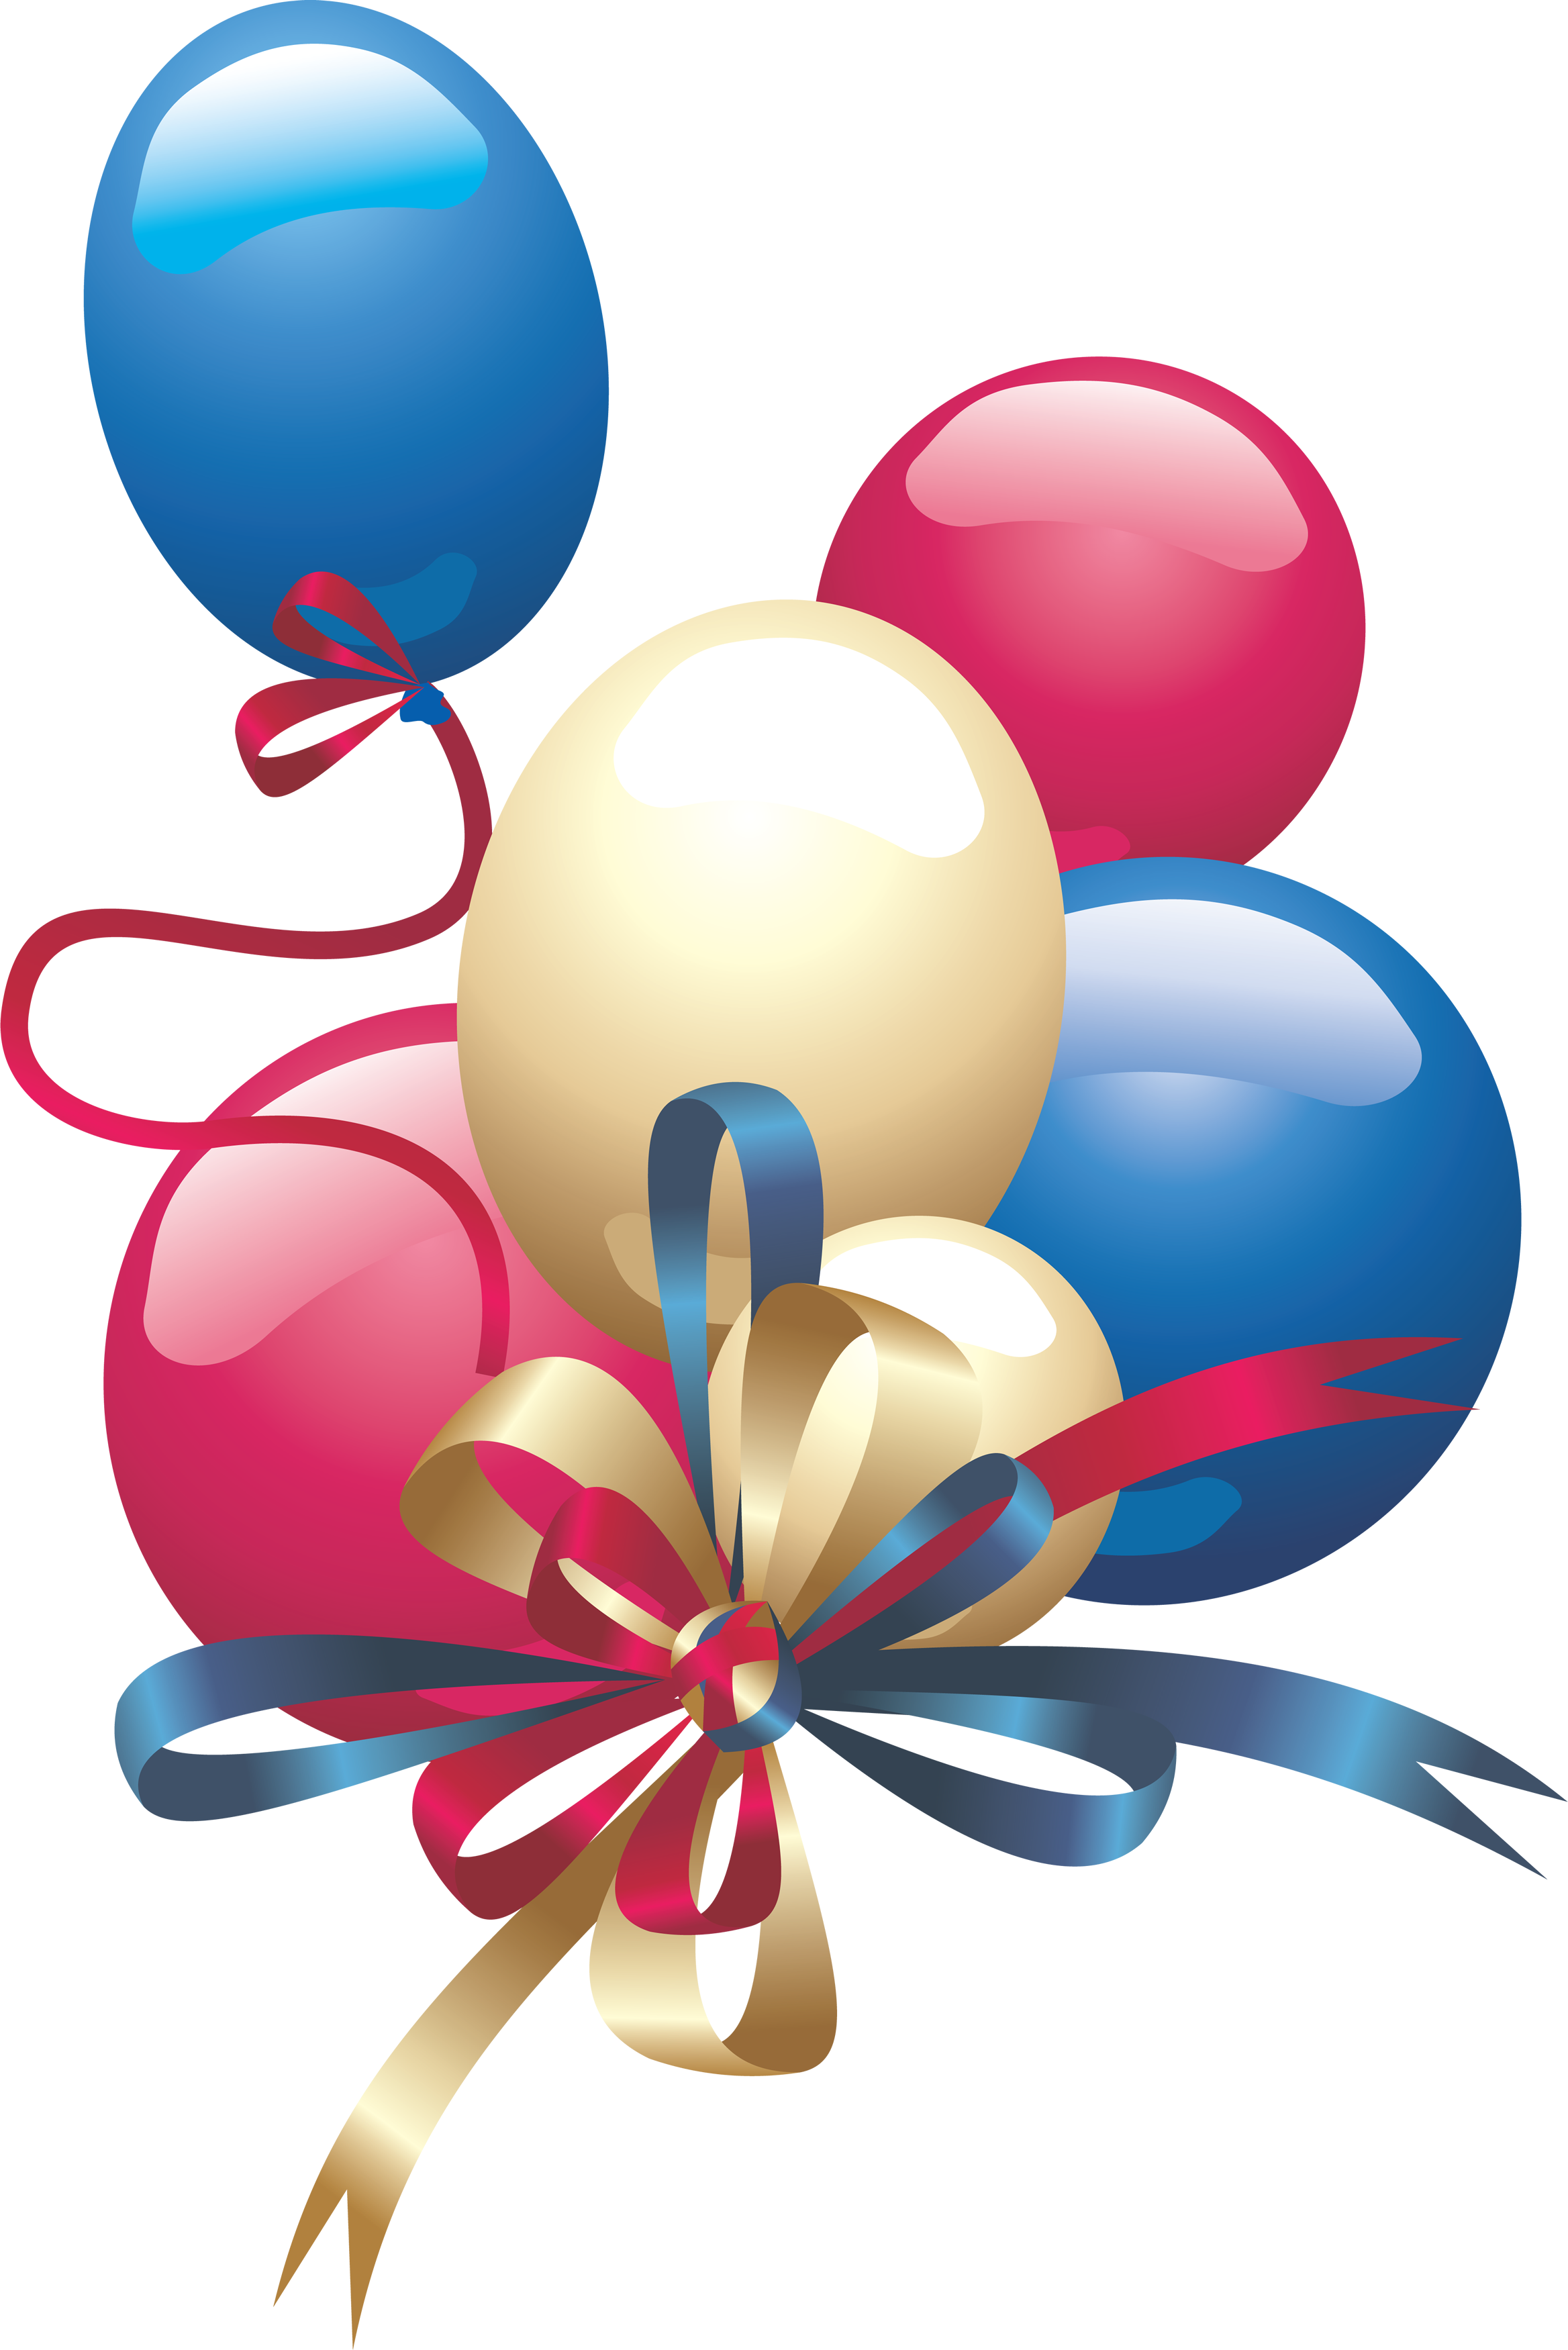 balloon_PNG4964